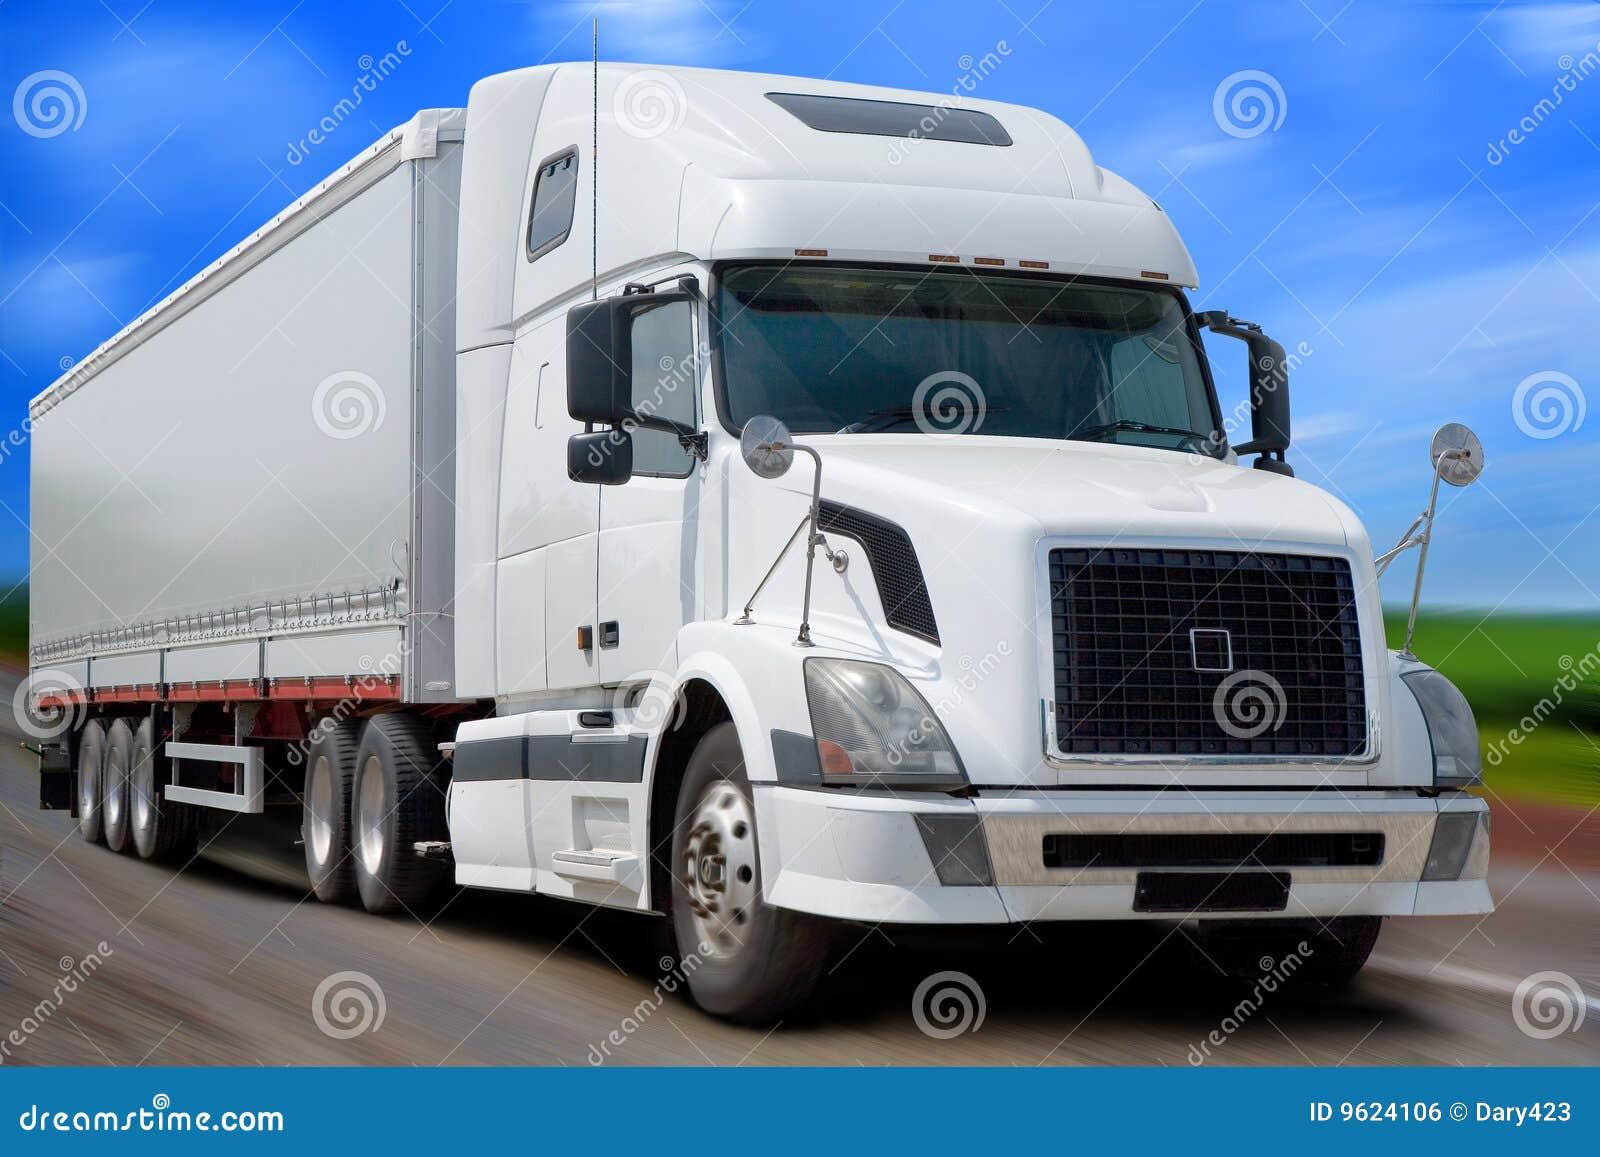 The white truck